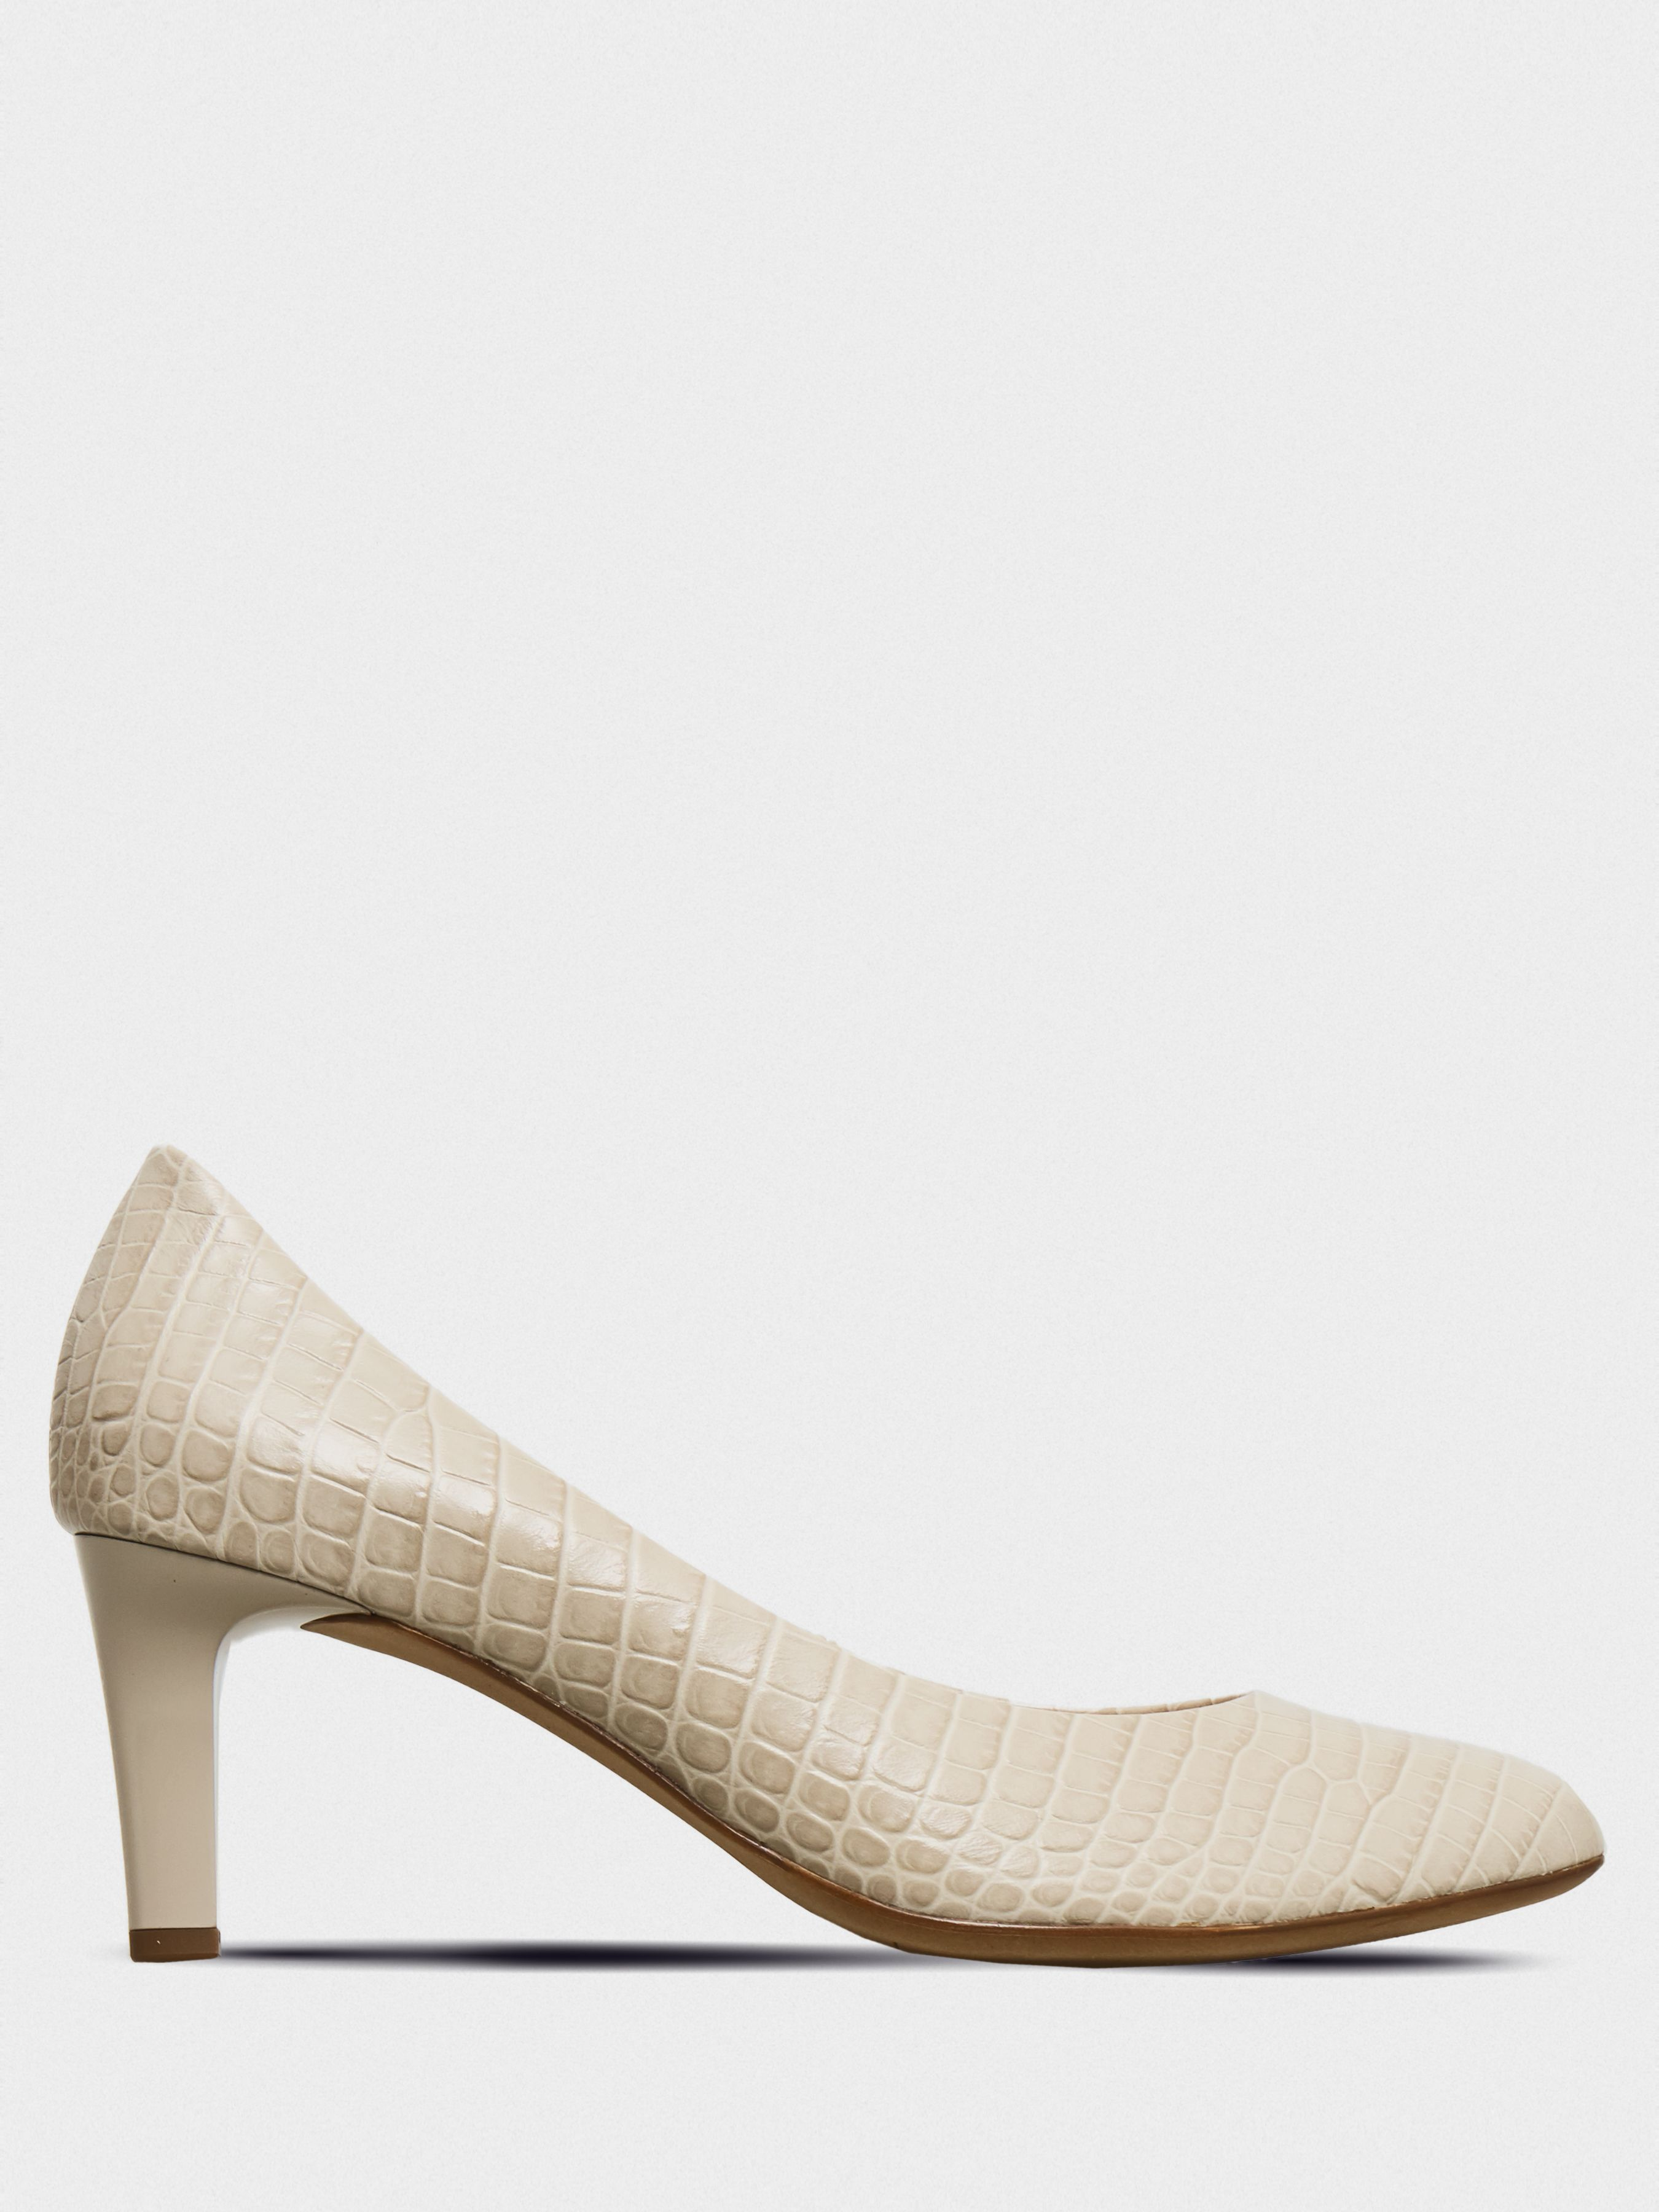 Купить Туфли женские Hogl STARLIGHT YN4023, Бежевый